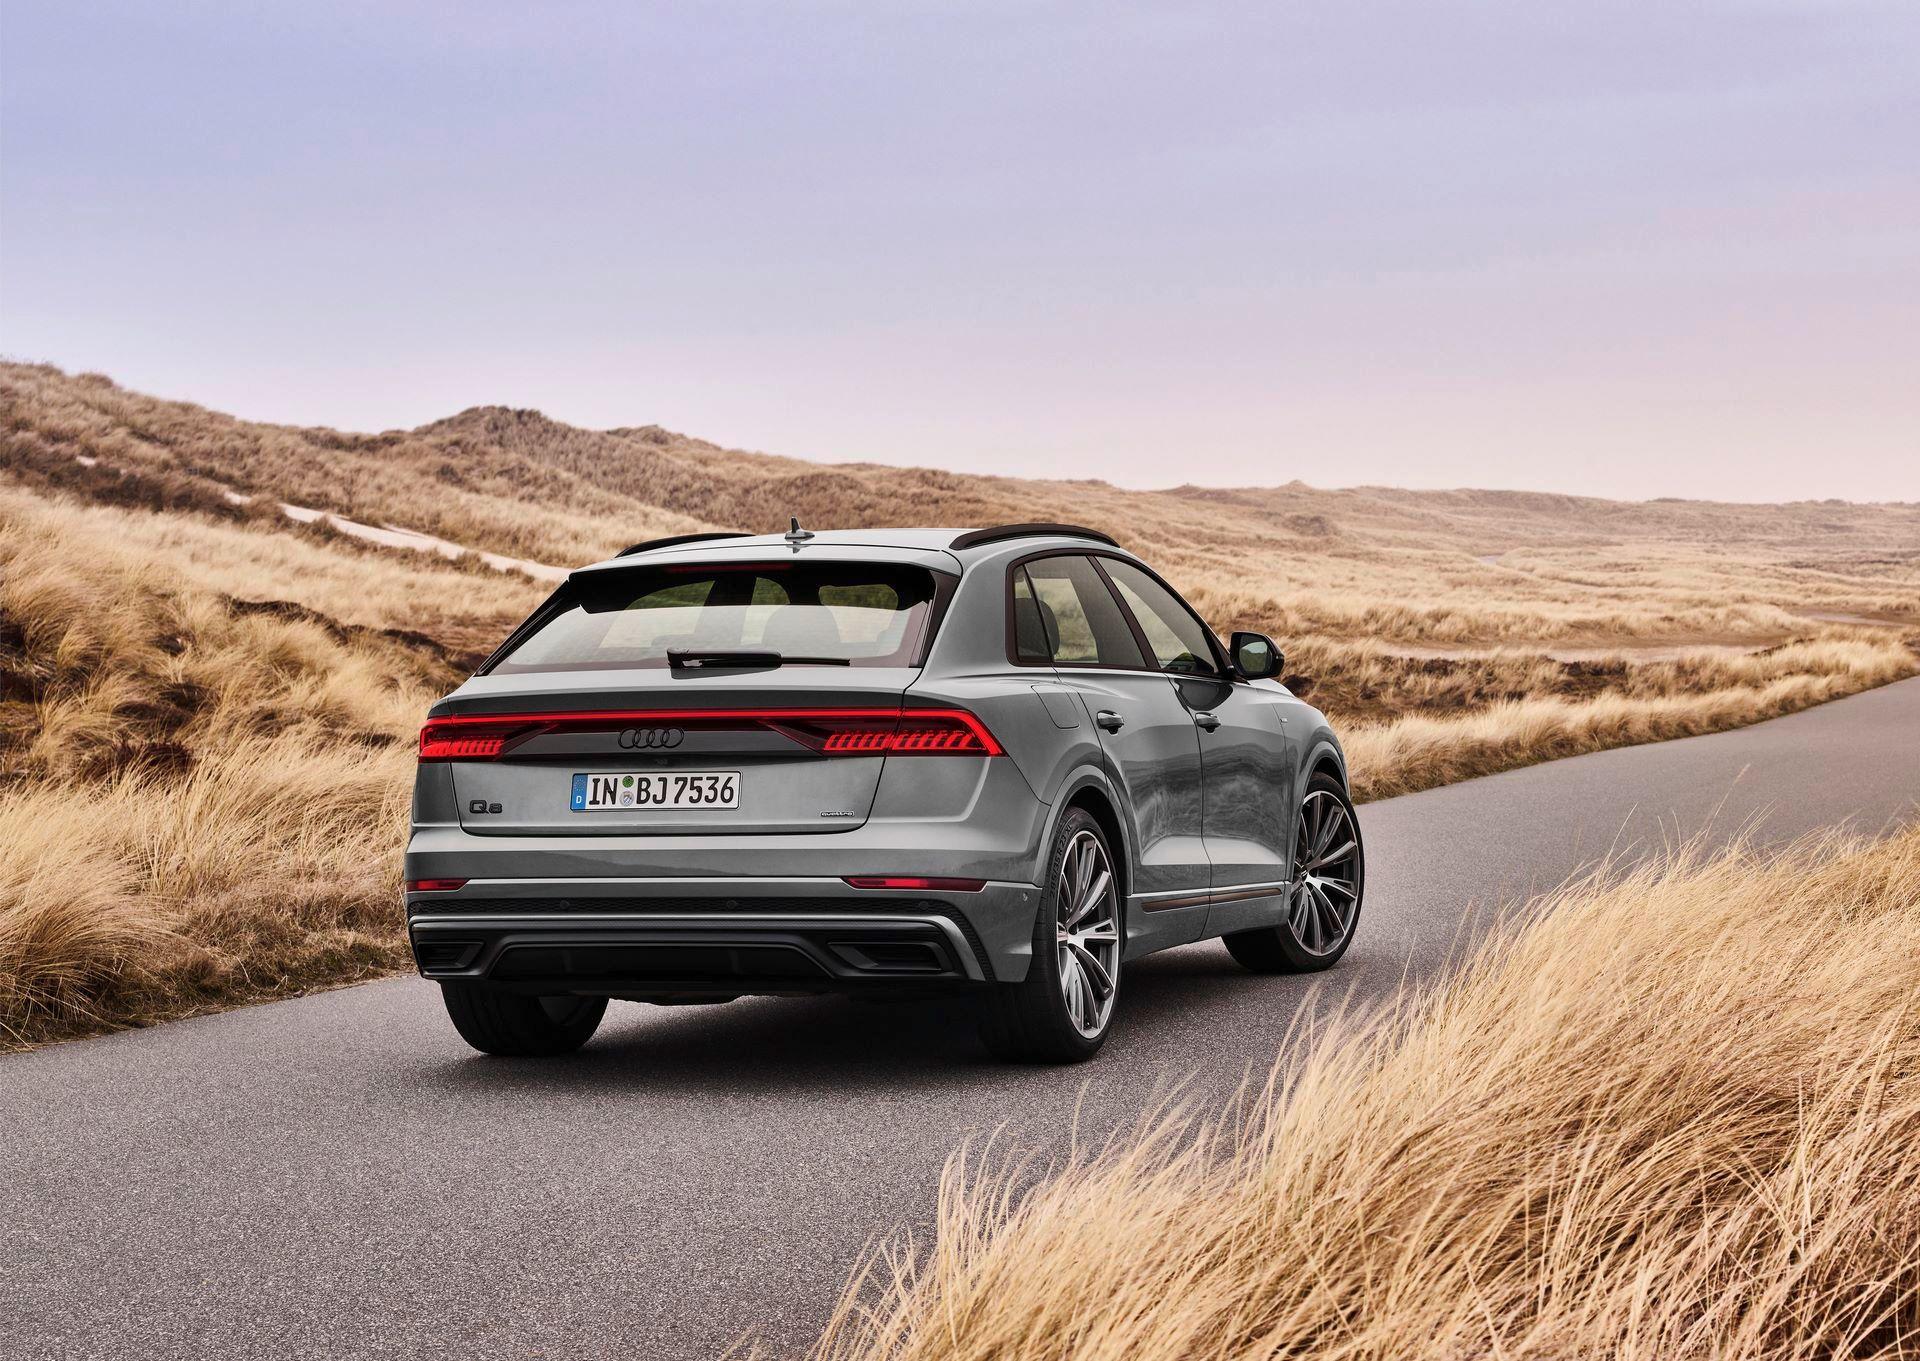 Audi-A4-A5-Q7-Q8-Competition-And-Competition-Plus-Trims-17